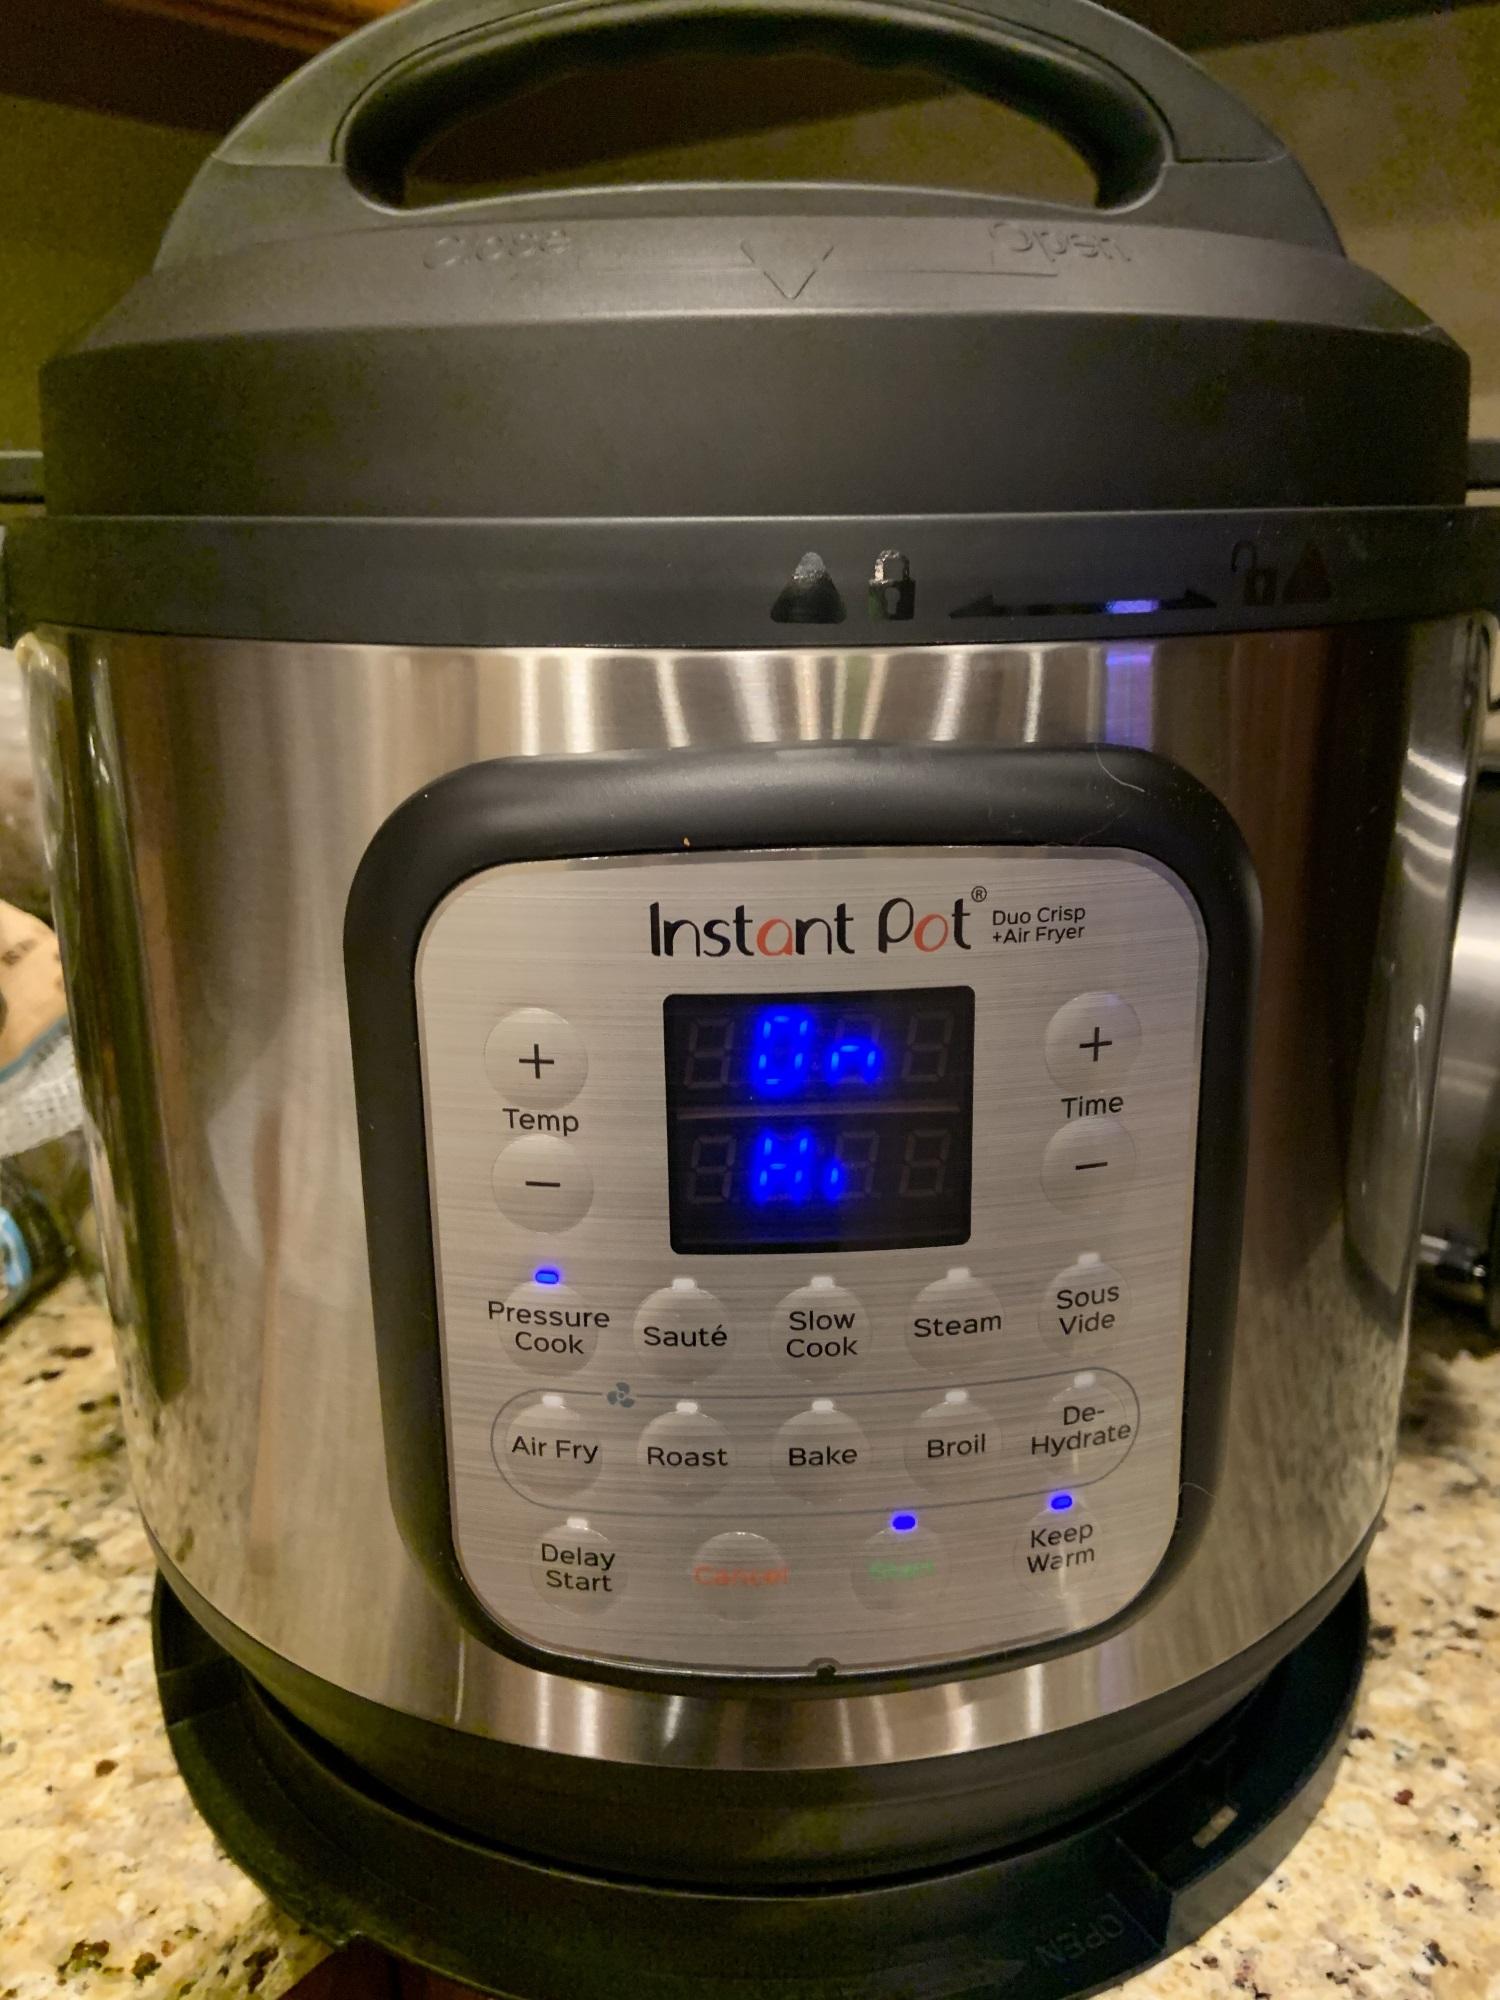 Instant Pot Duo Crisp Pressure Cooker Air Fryer